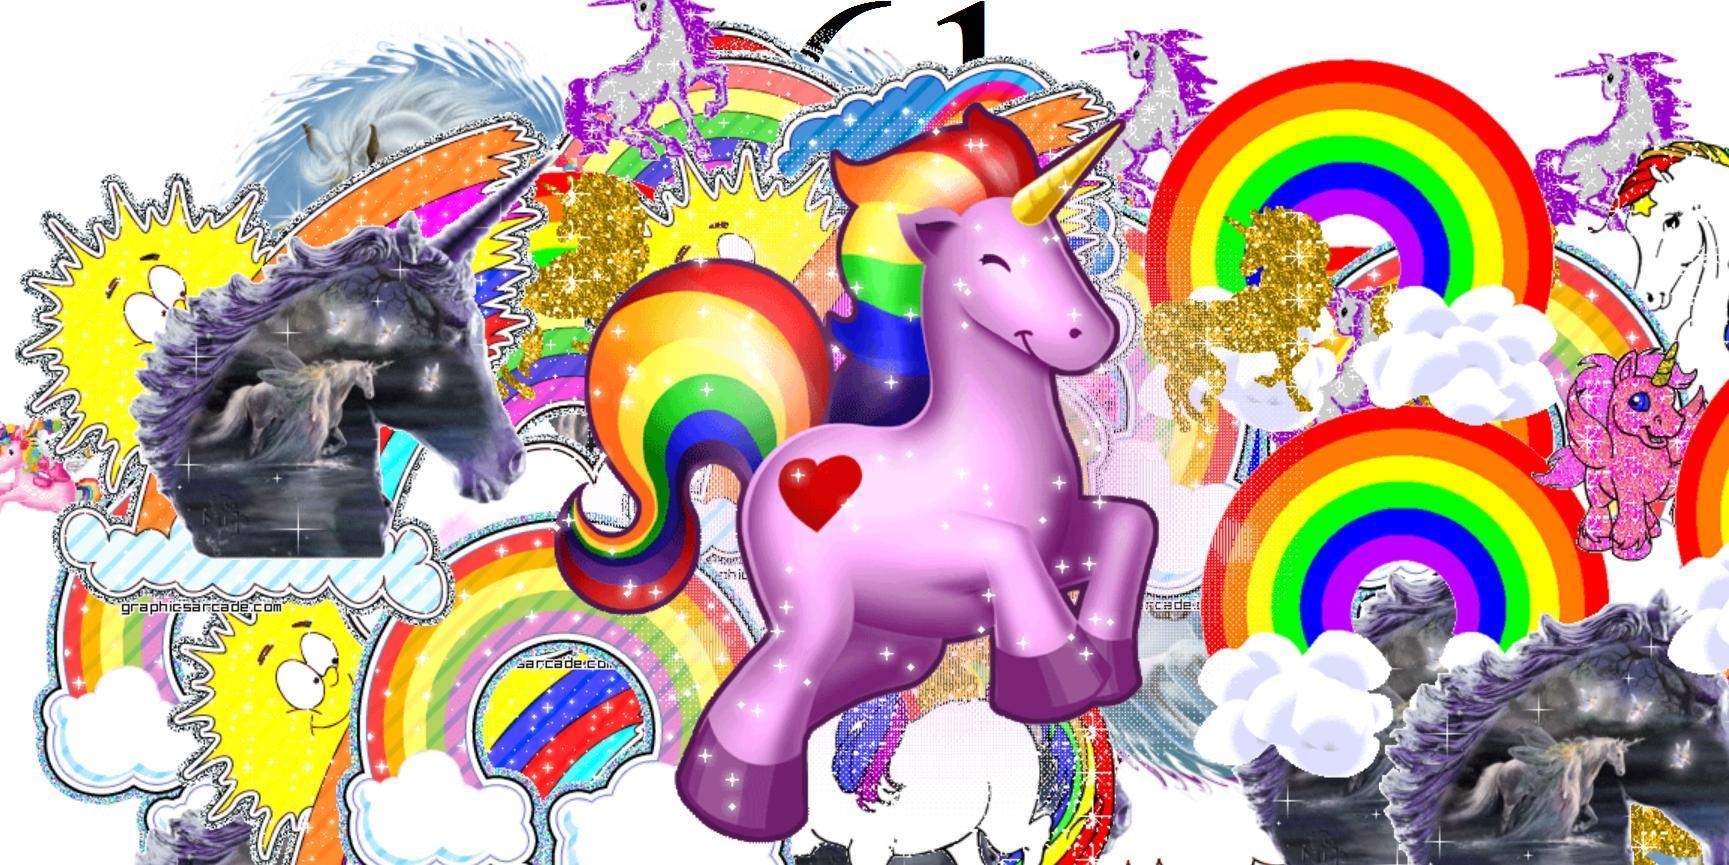 Unicorn Rainbow Wallpapers - Top Free Unicorn Rainbow ...